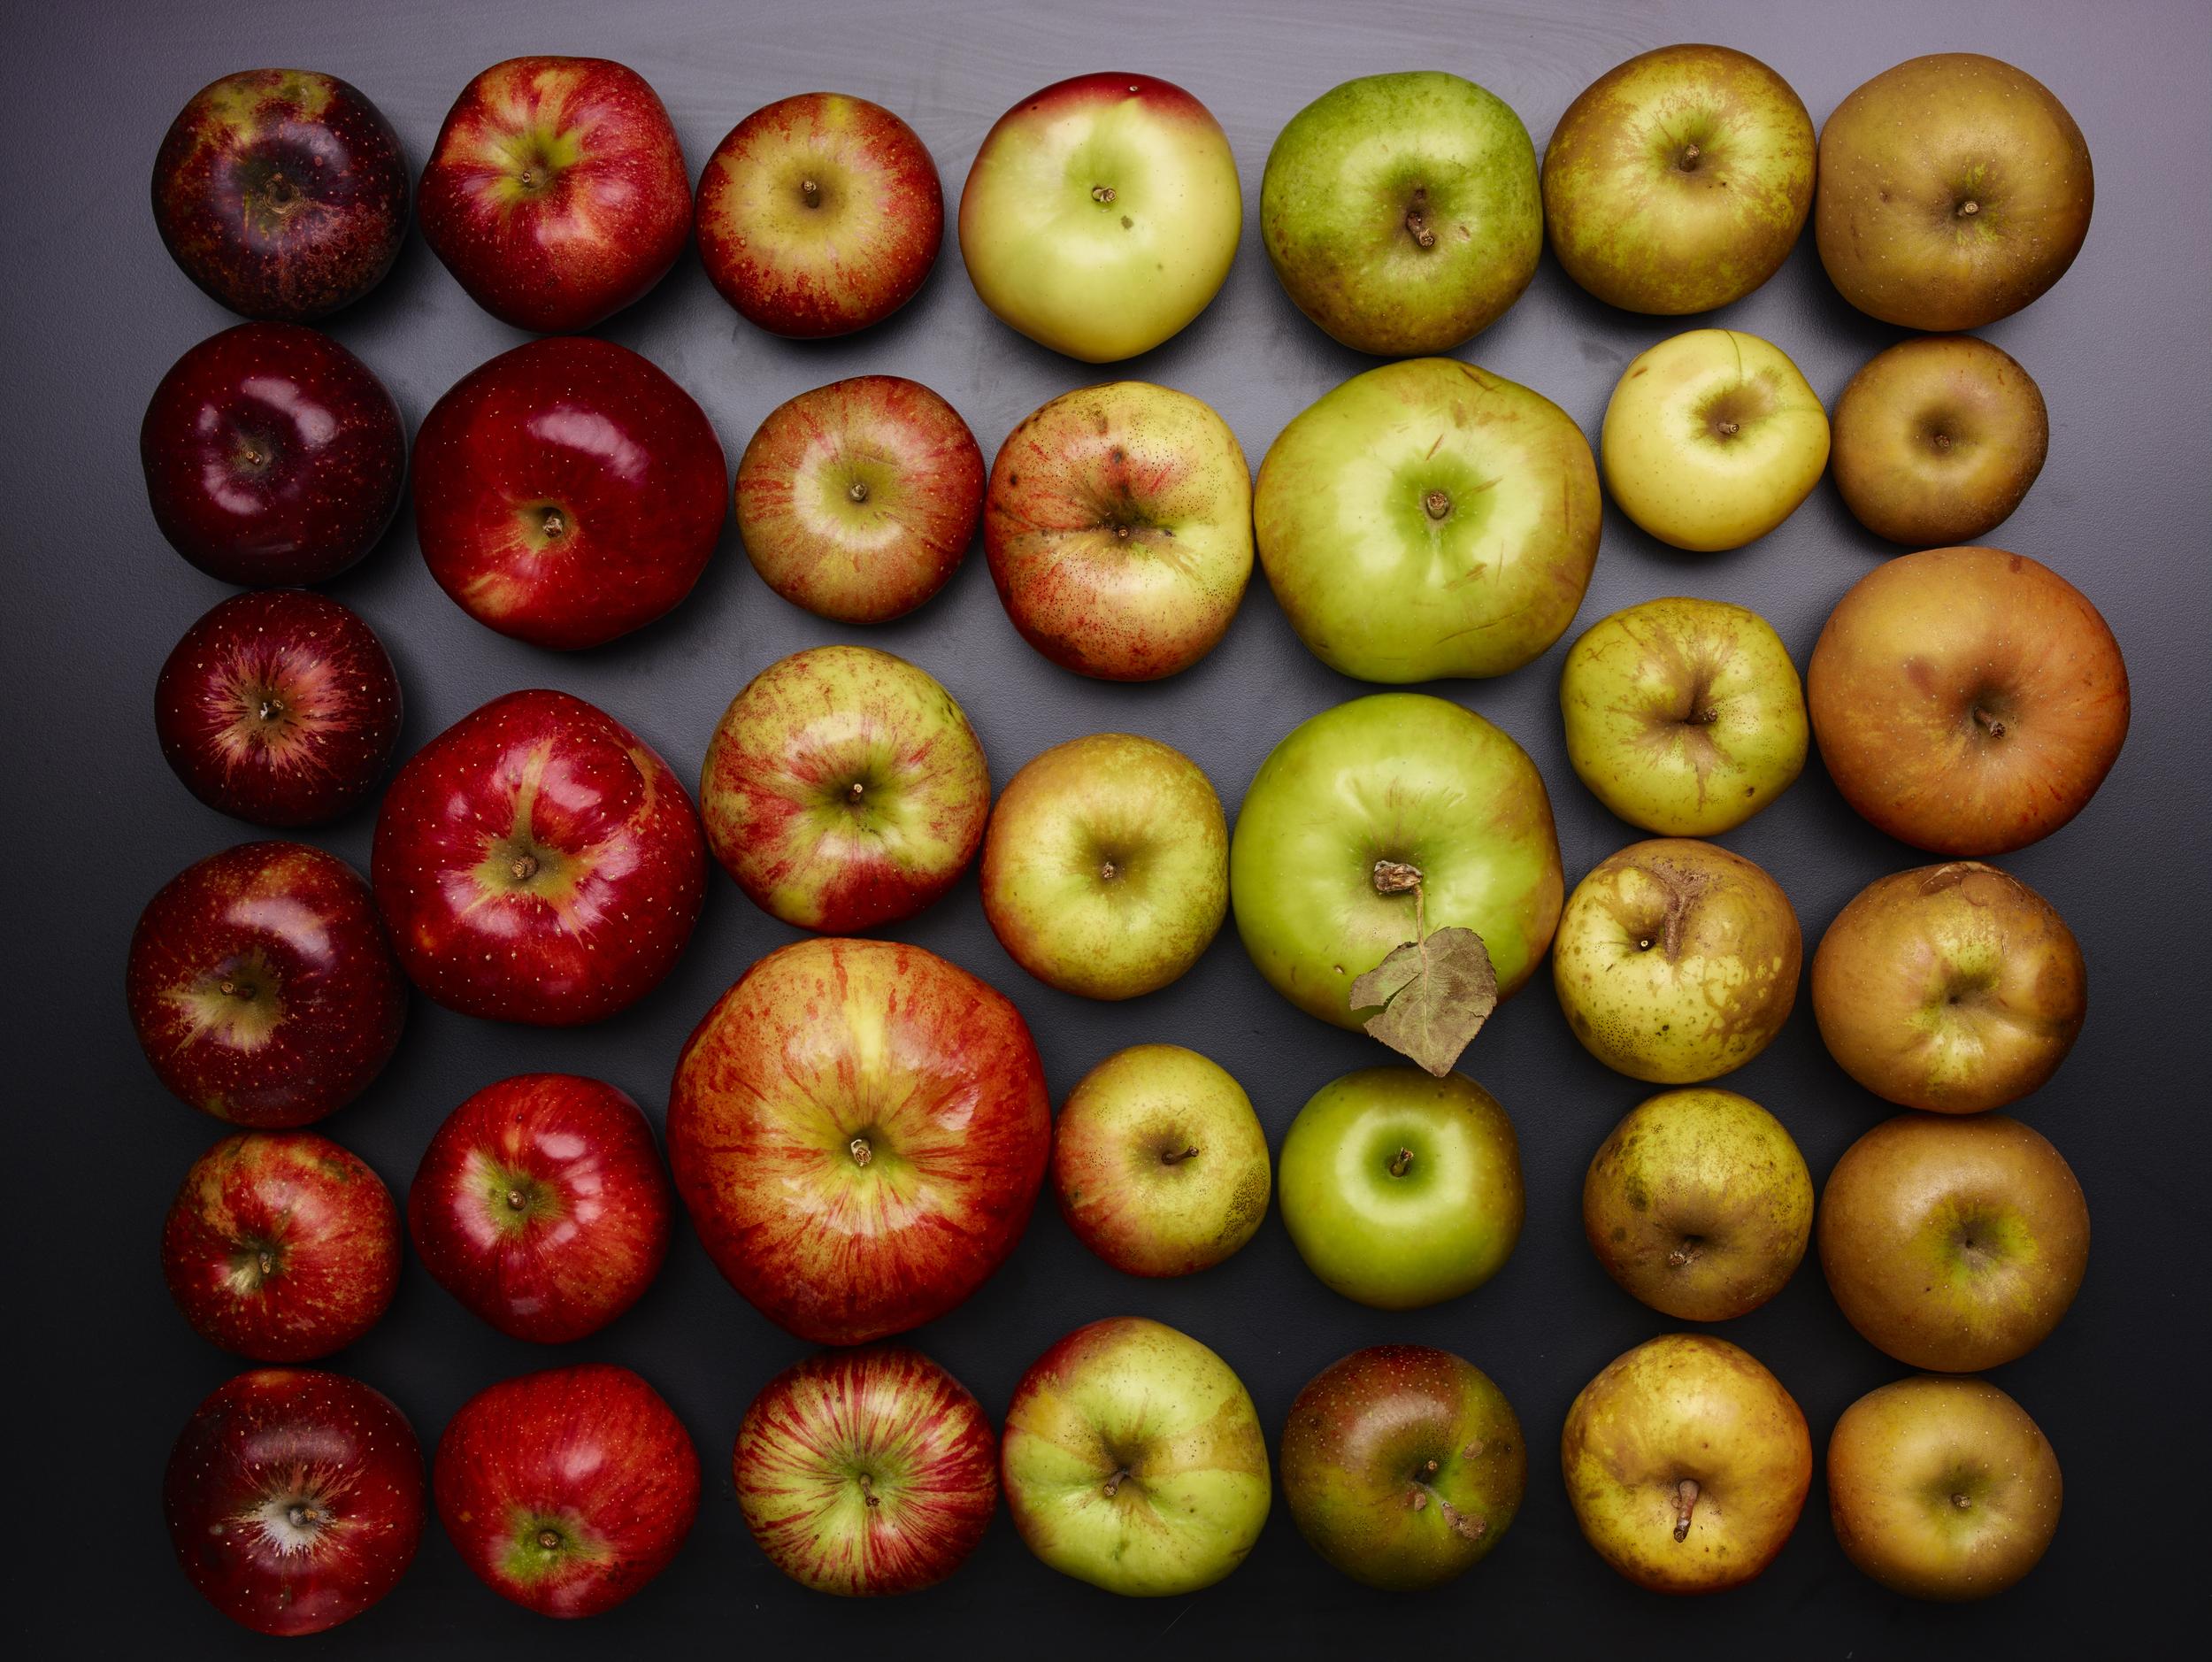 Apples15587.jpg